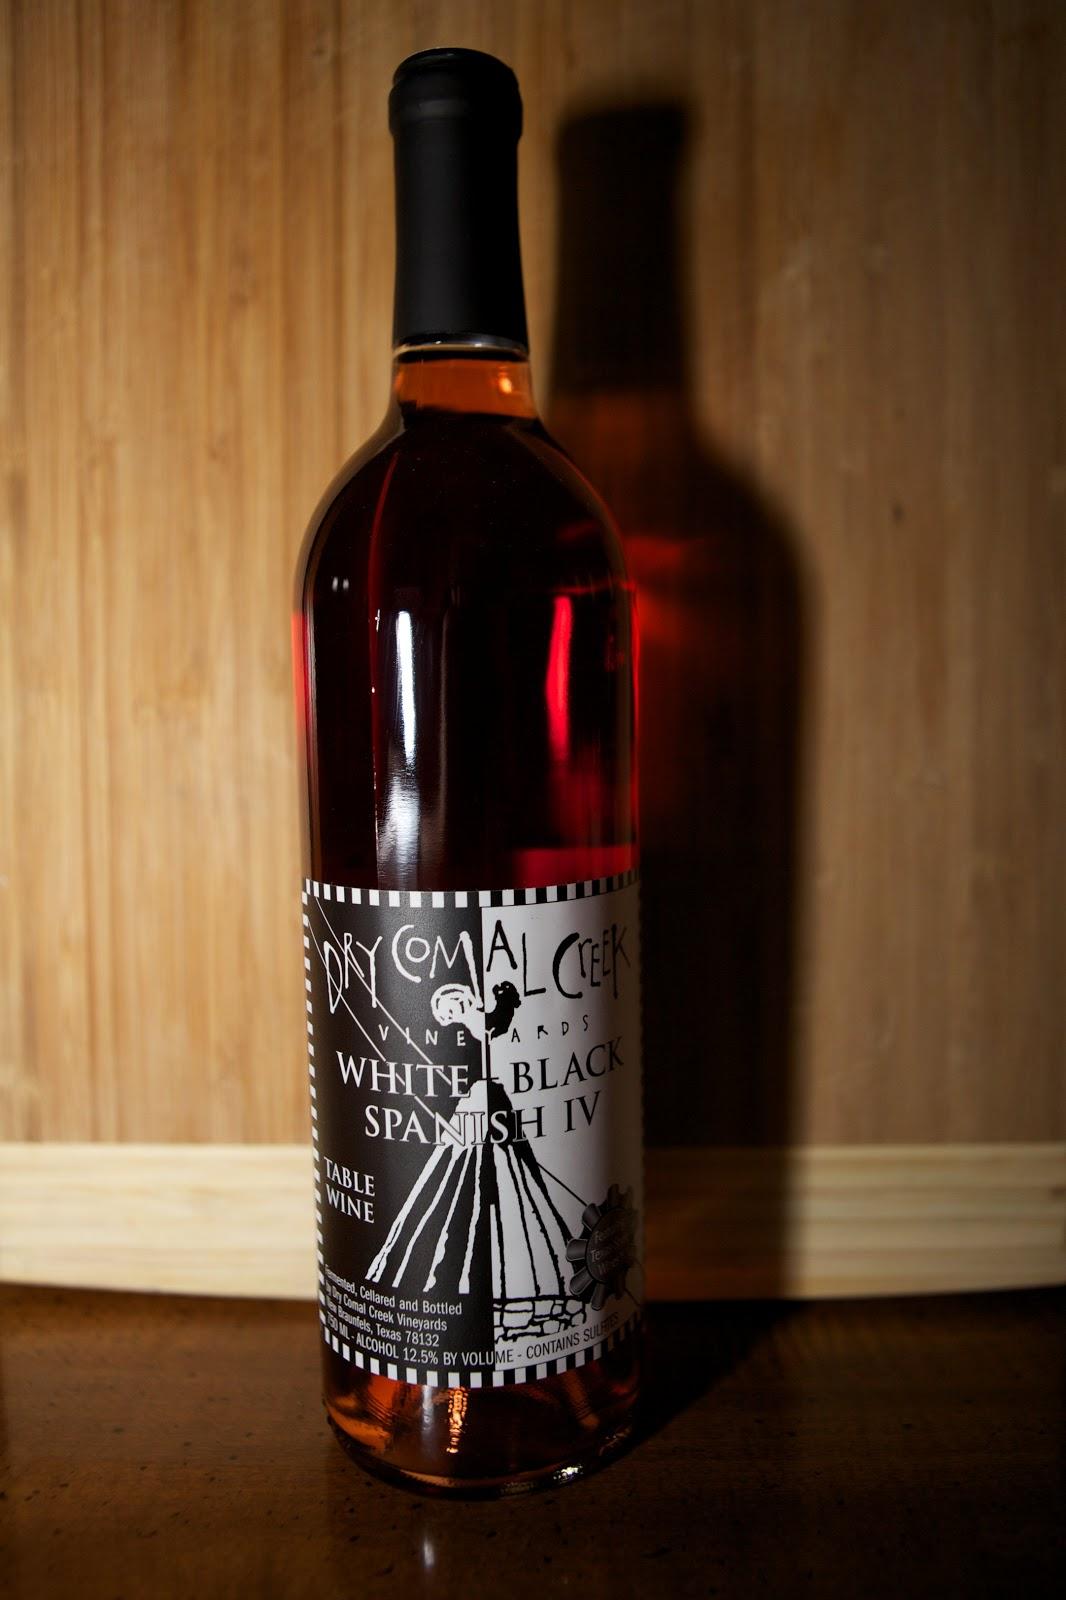 Wino's Wine Cellar: Dry Comal Creek Wine Collection